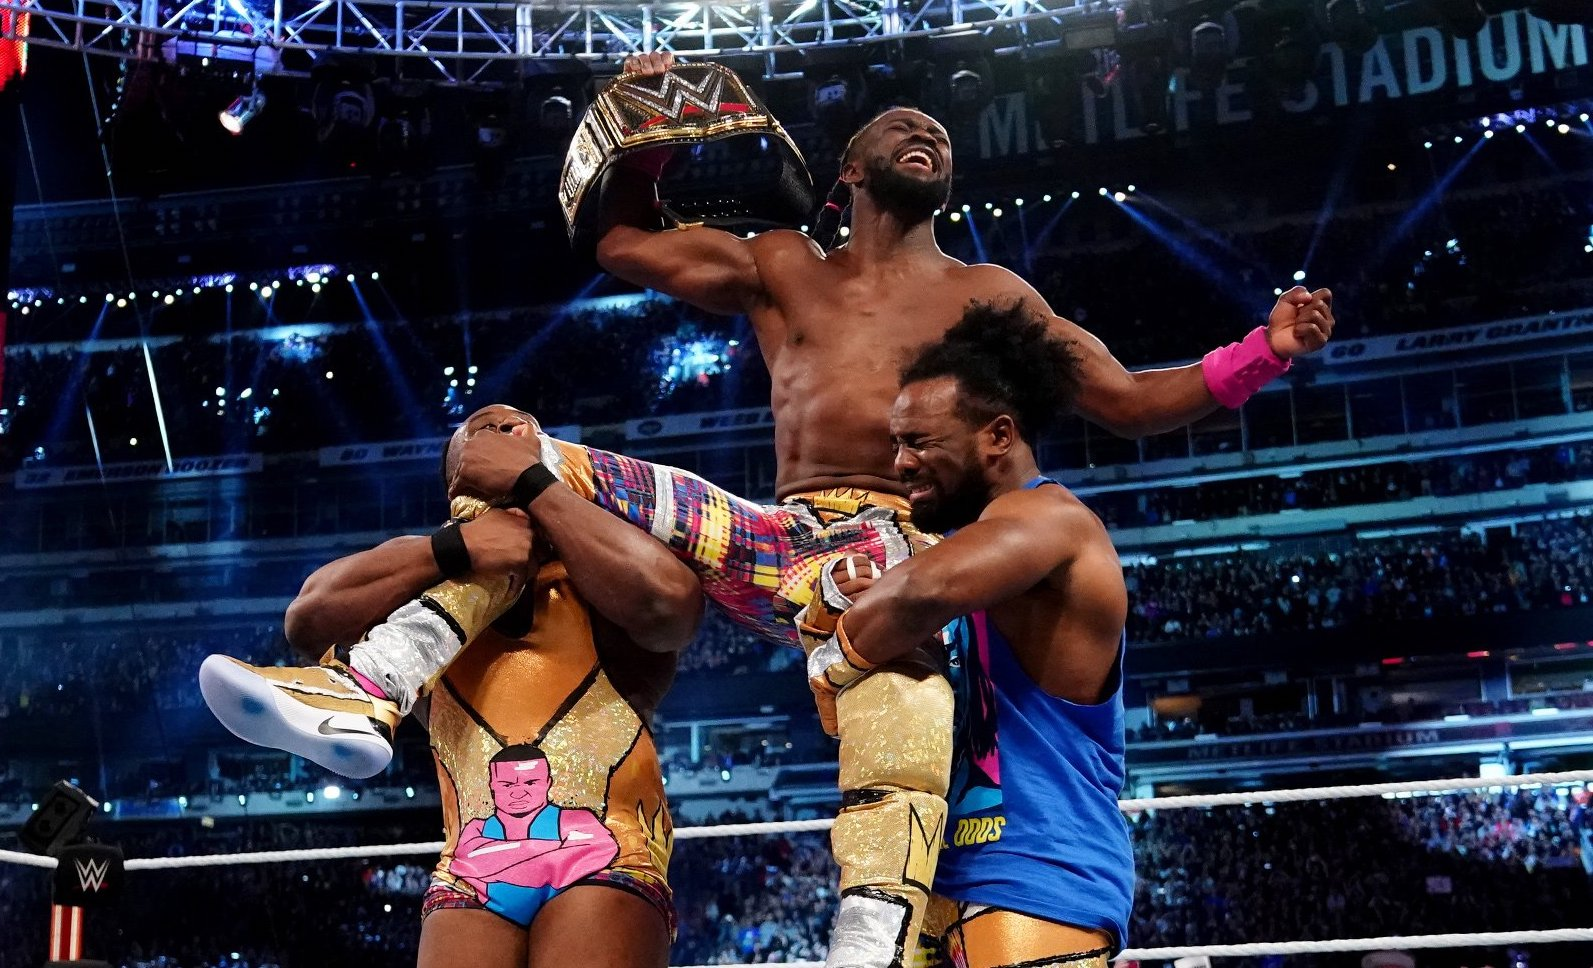 WWE Wrestlemania 35 Review 04/07/2019